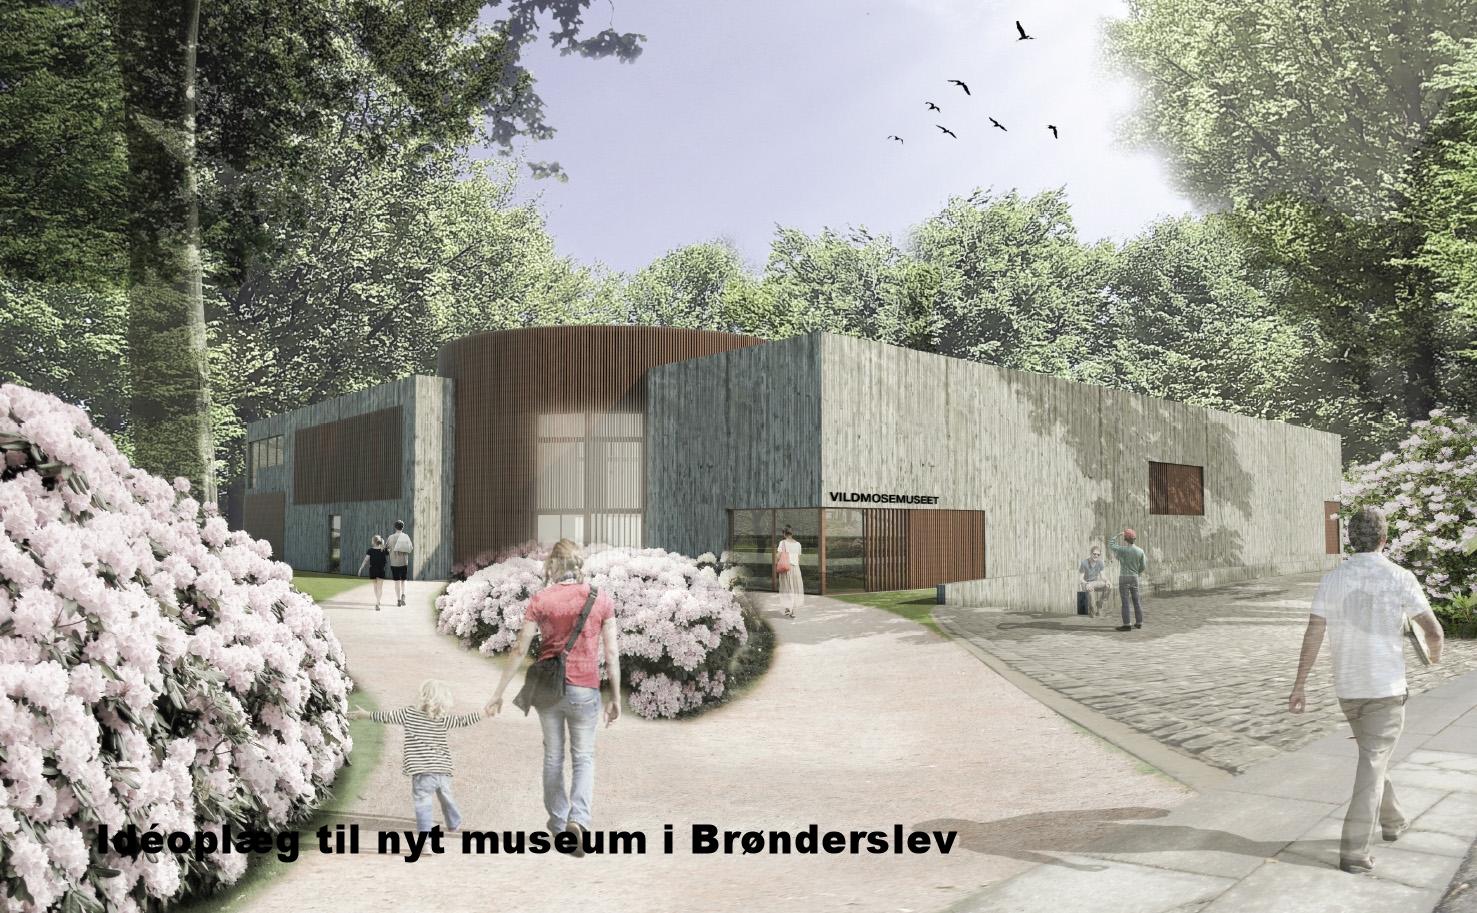 Vildmosemuseet visualisering.jpg